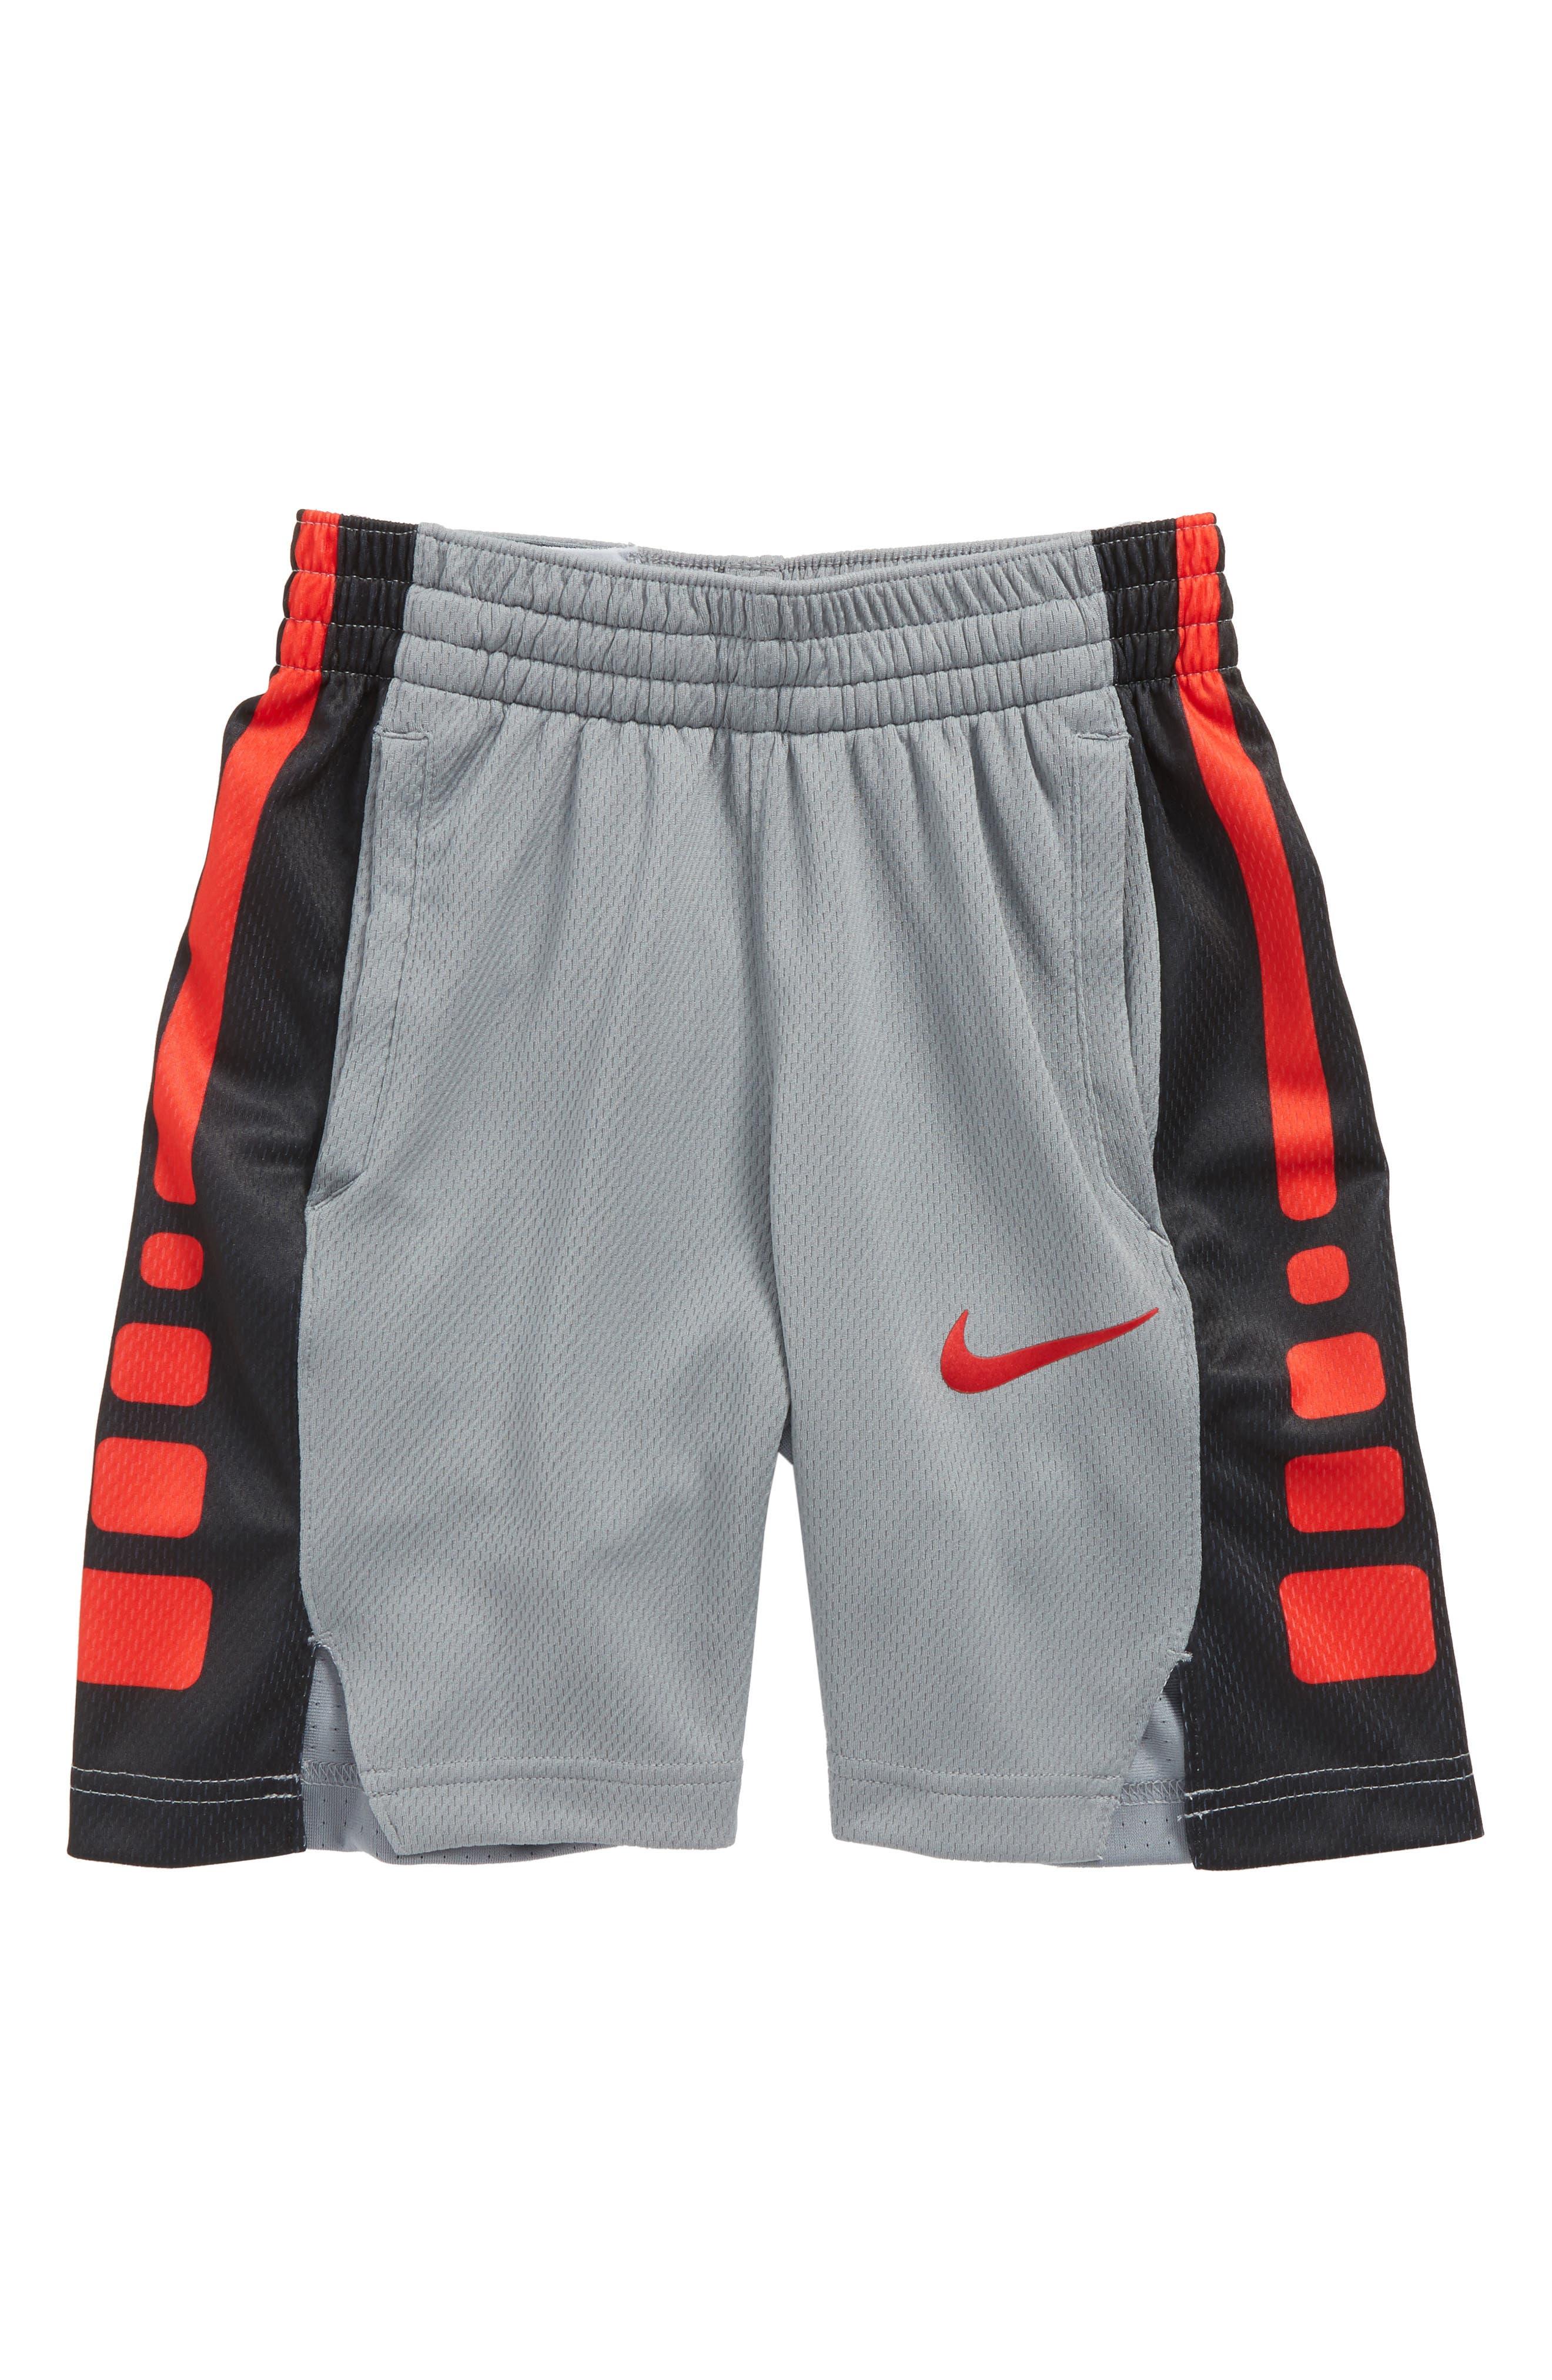 Dry Elite Basketball Shorts,                         Main,                         color, Grey